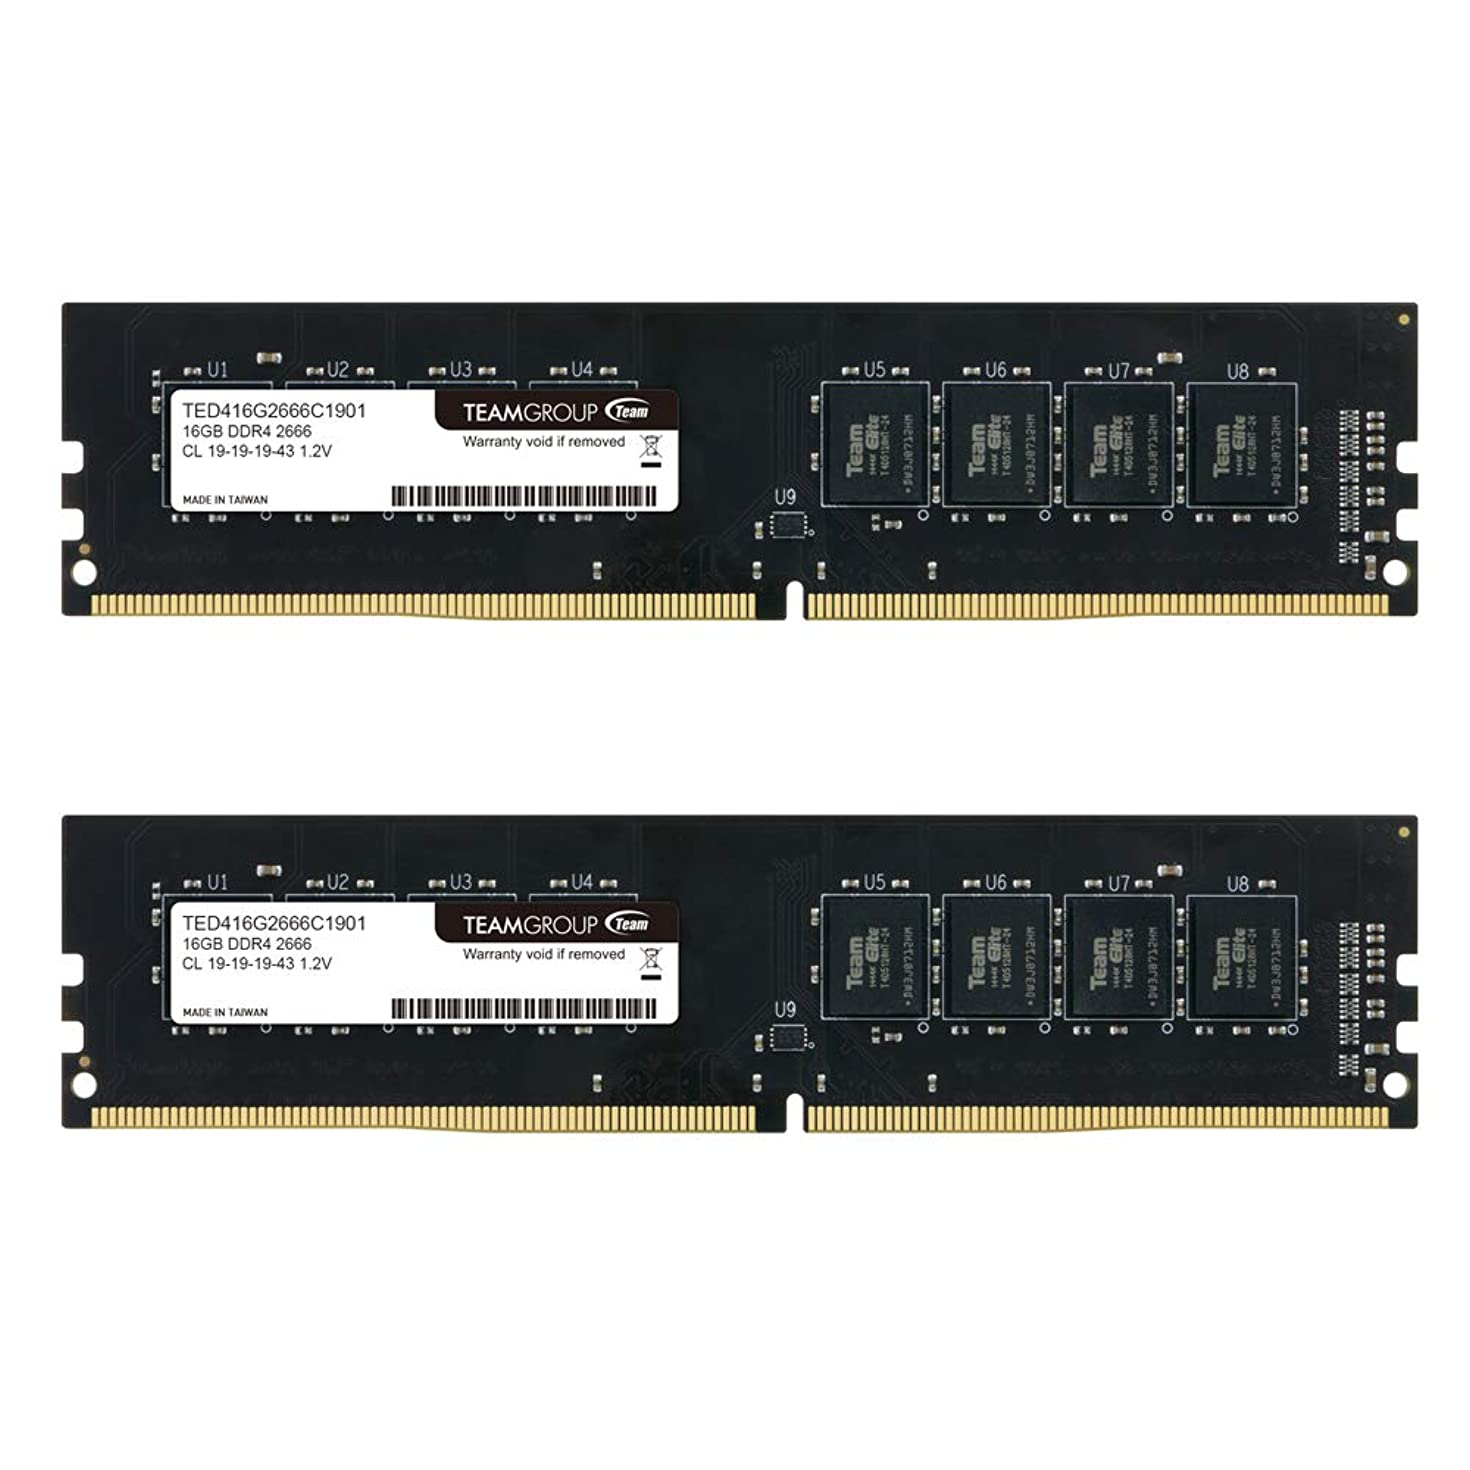 TEAMGROUP Elite DDR4 16GB Single 2666MHz (PC4-21300) CL19 Unbuffered Non-ECC 1.2V UDIMM 288 Pin PC Computer Desktop Memory Module Ram Upgrade - TED416G2666C1901 - (1x16GB) Single